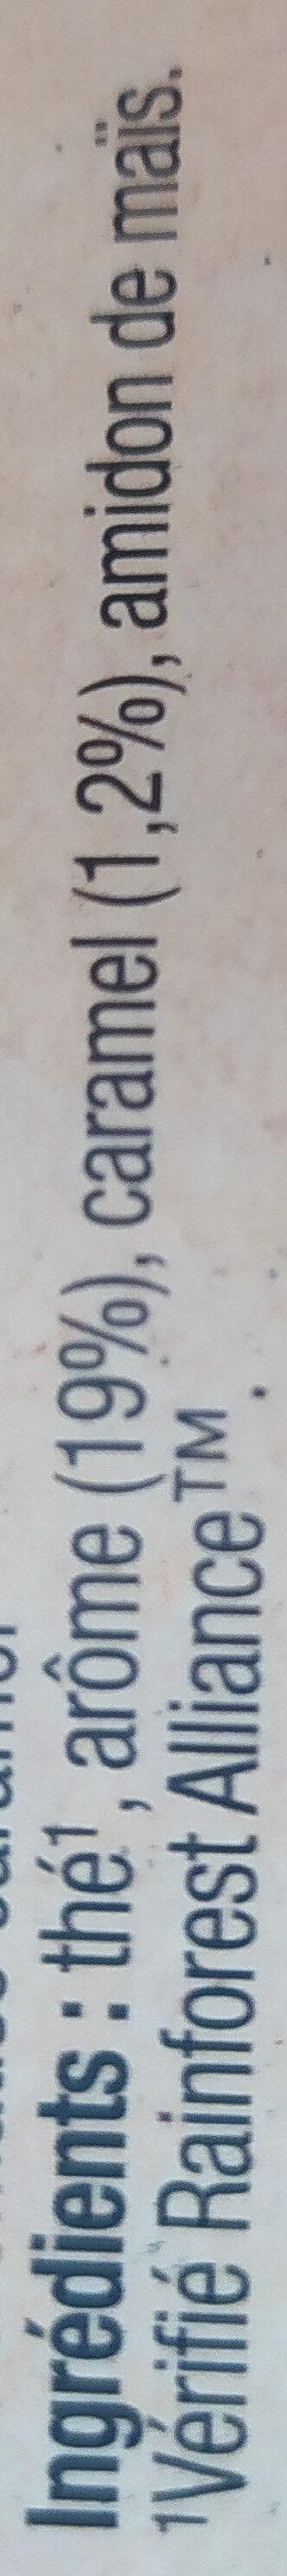 Lipton Thé Caramel 25 Sachets - Ingredients - fr